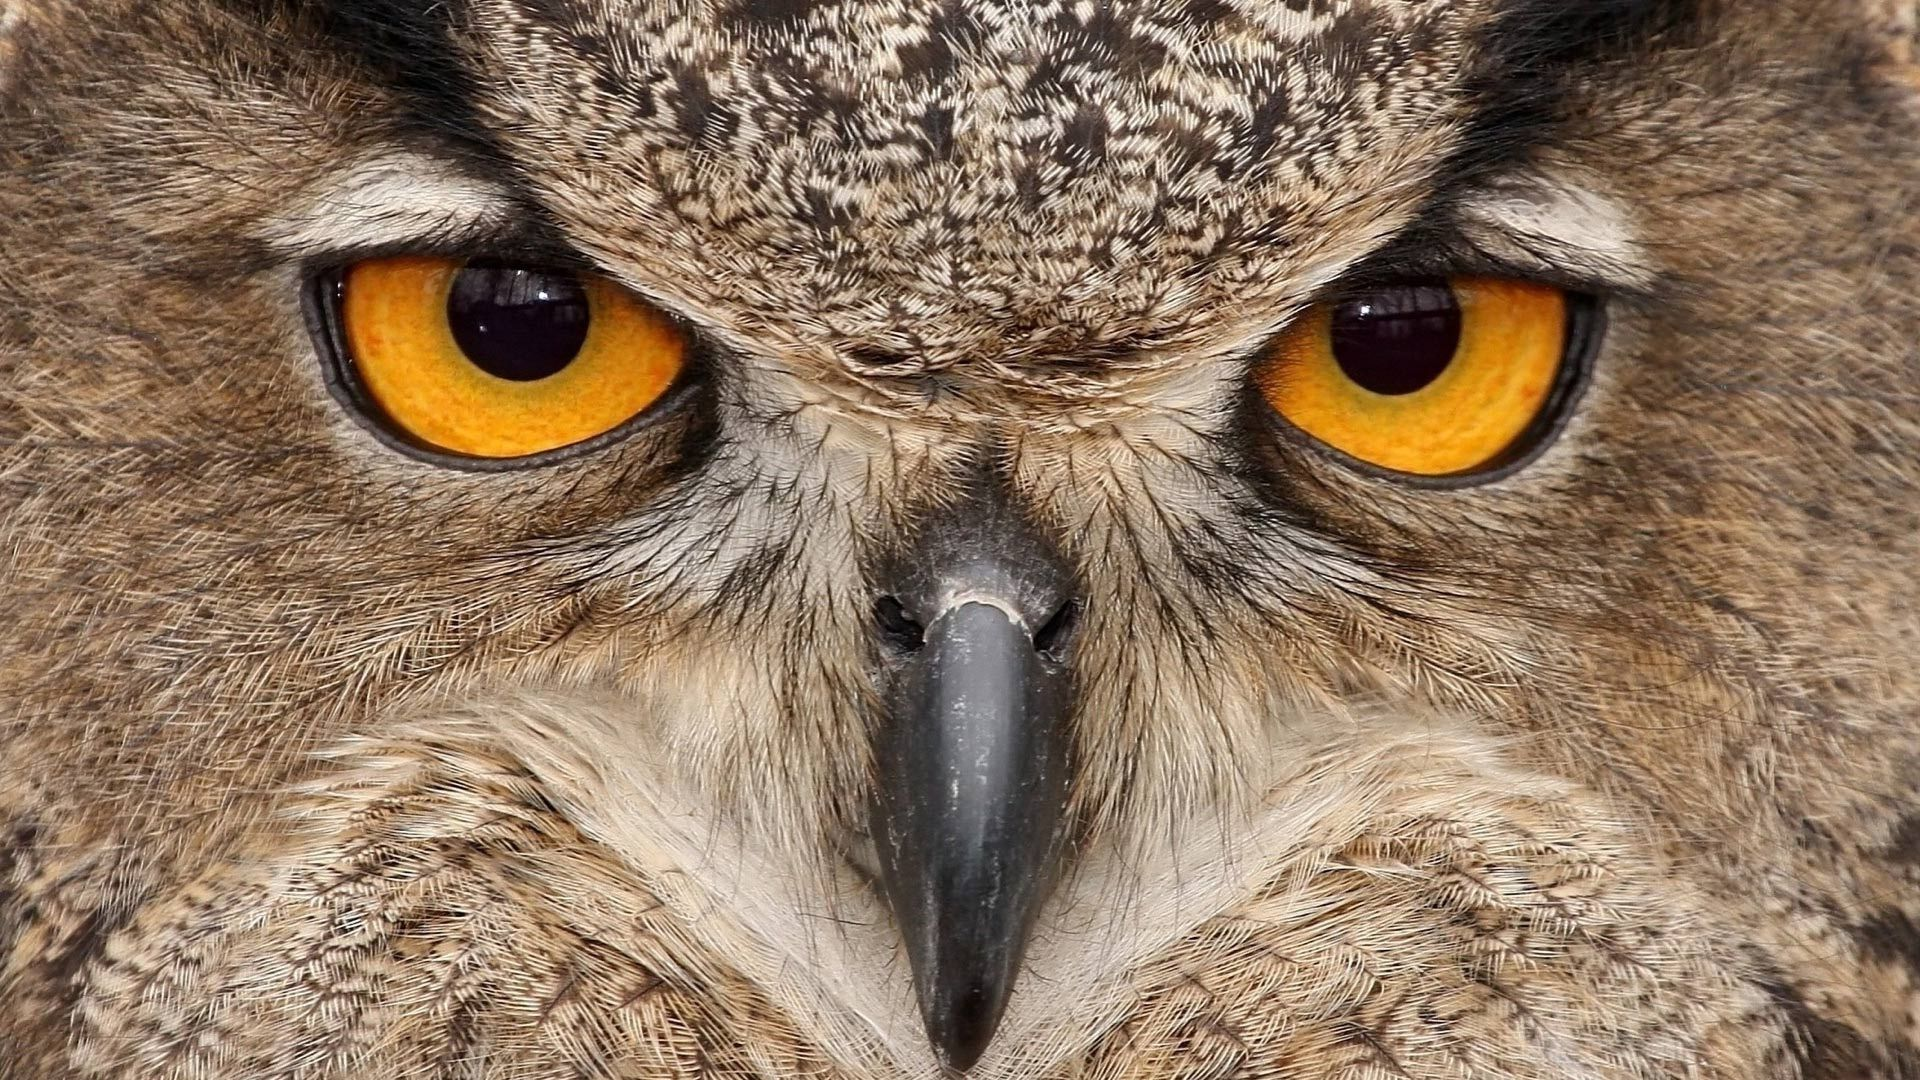 The Beak Of The Owl